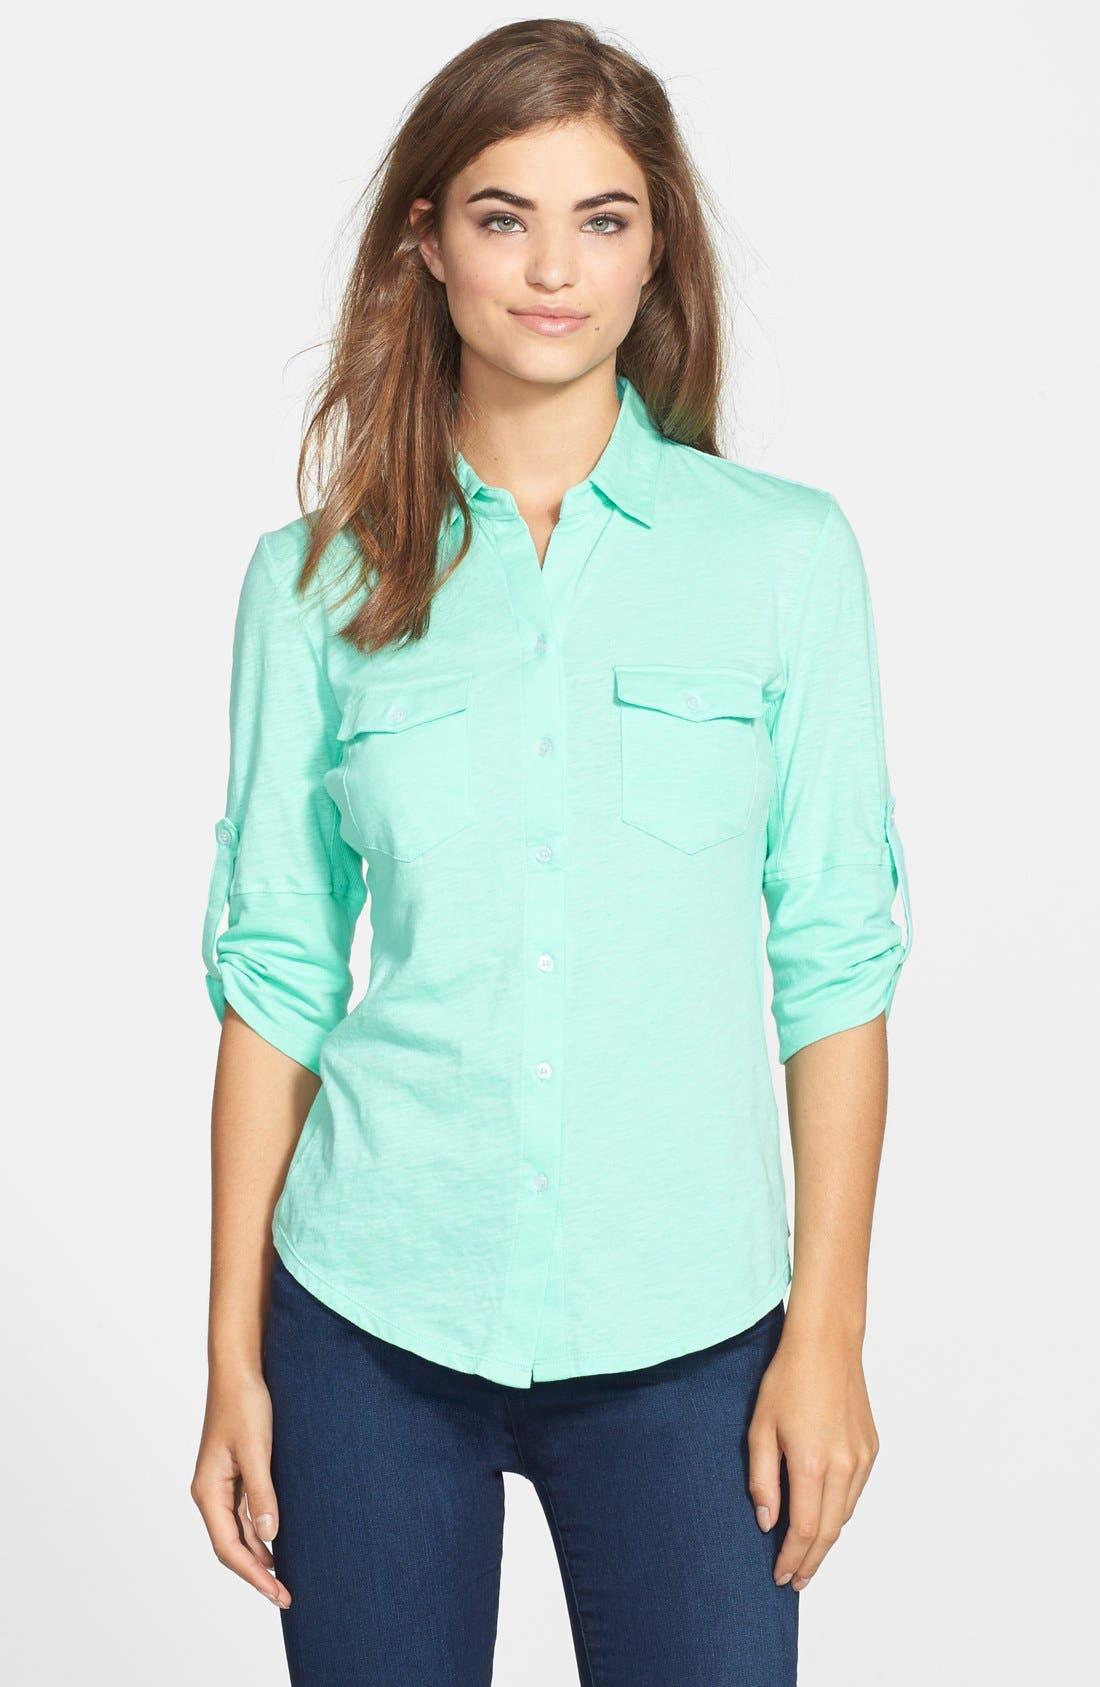 Alternate Image 1 Selected - Sandra Three Quarter Roll Sleeve Knit Shirt